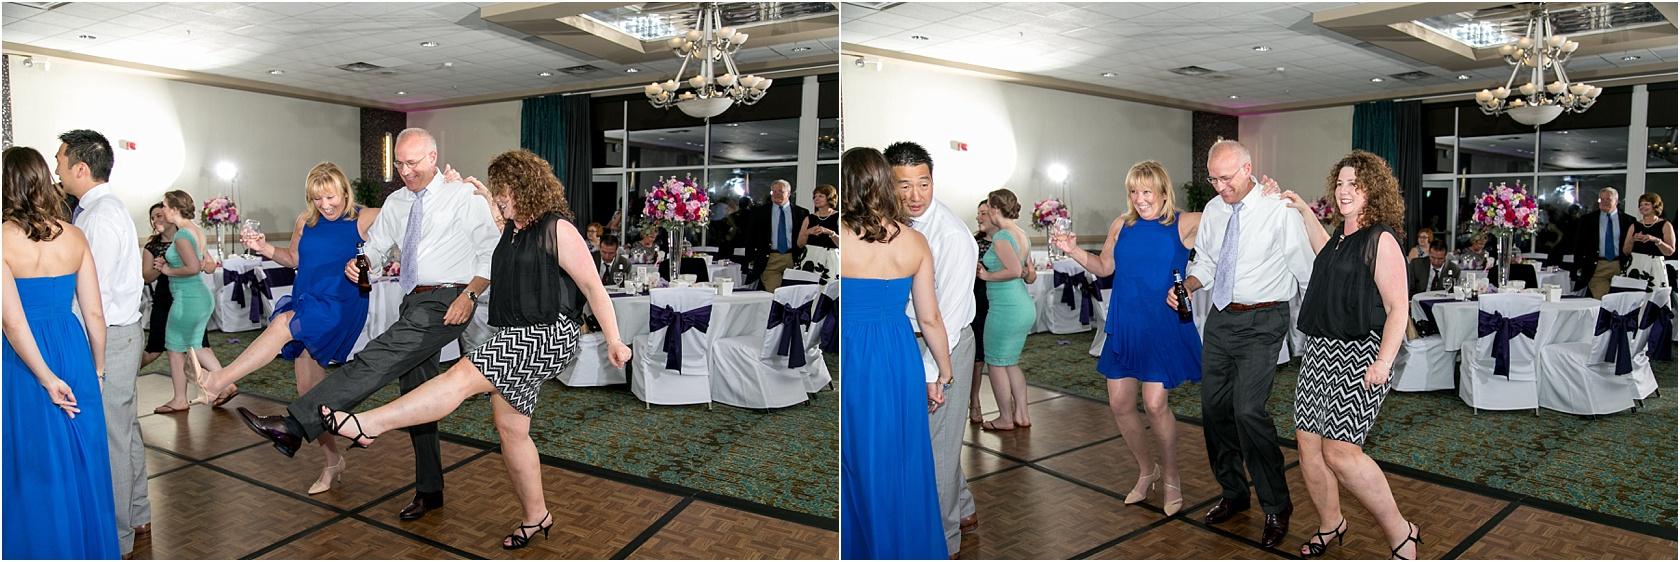 Sagal Wedding Turf Valley Resort Wedding Living Radiant Photography_0154.jpg